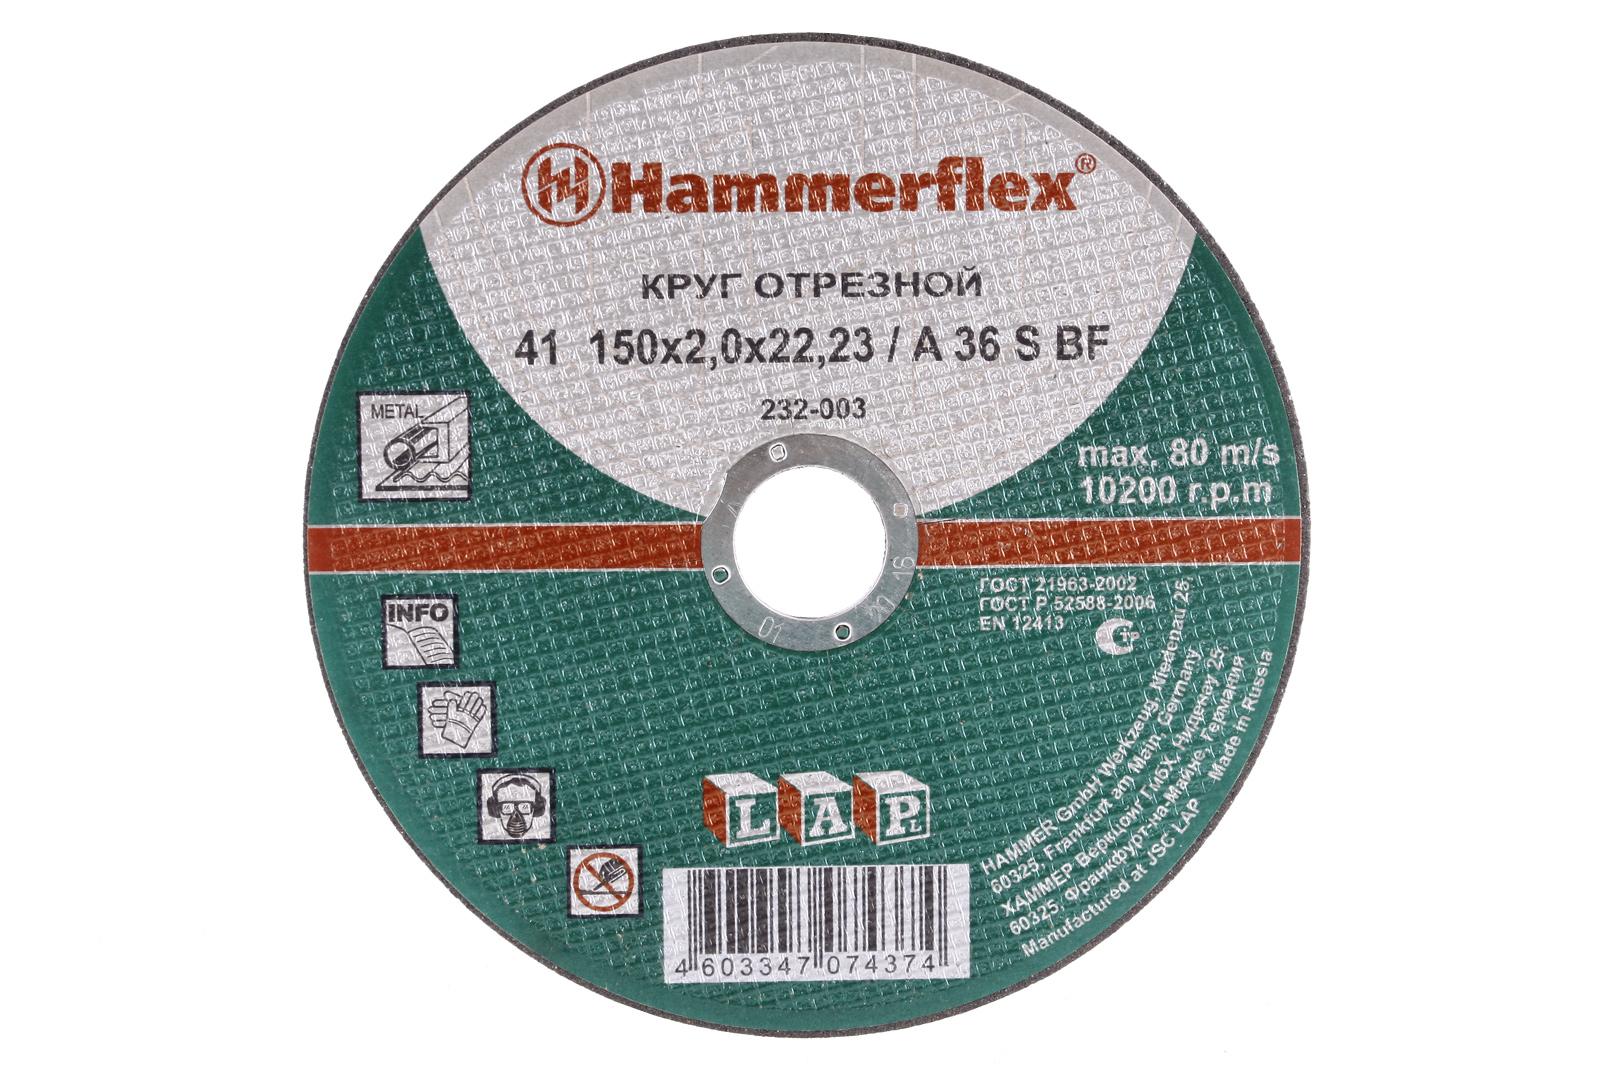 Круг отрезной Hammer 150 x 2.0 x 22 по металлу Коробка (200шт.) круг отрезной hammer 150 x 2 0 x 22 по металлу коробка 200шт